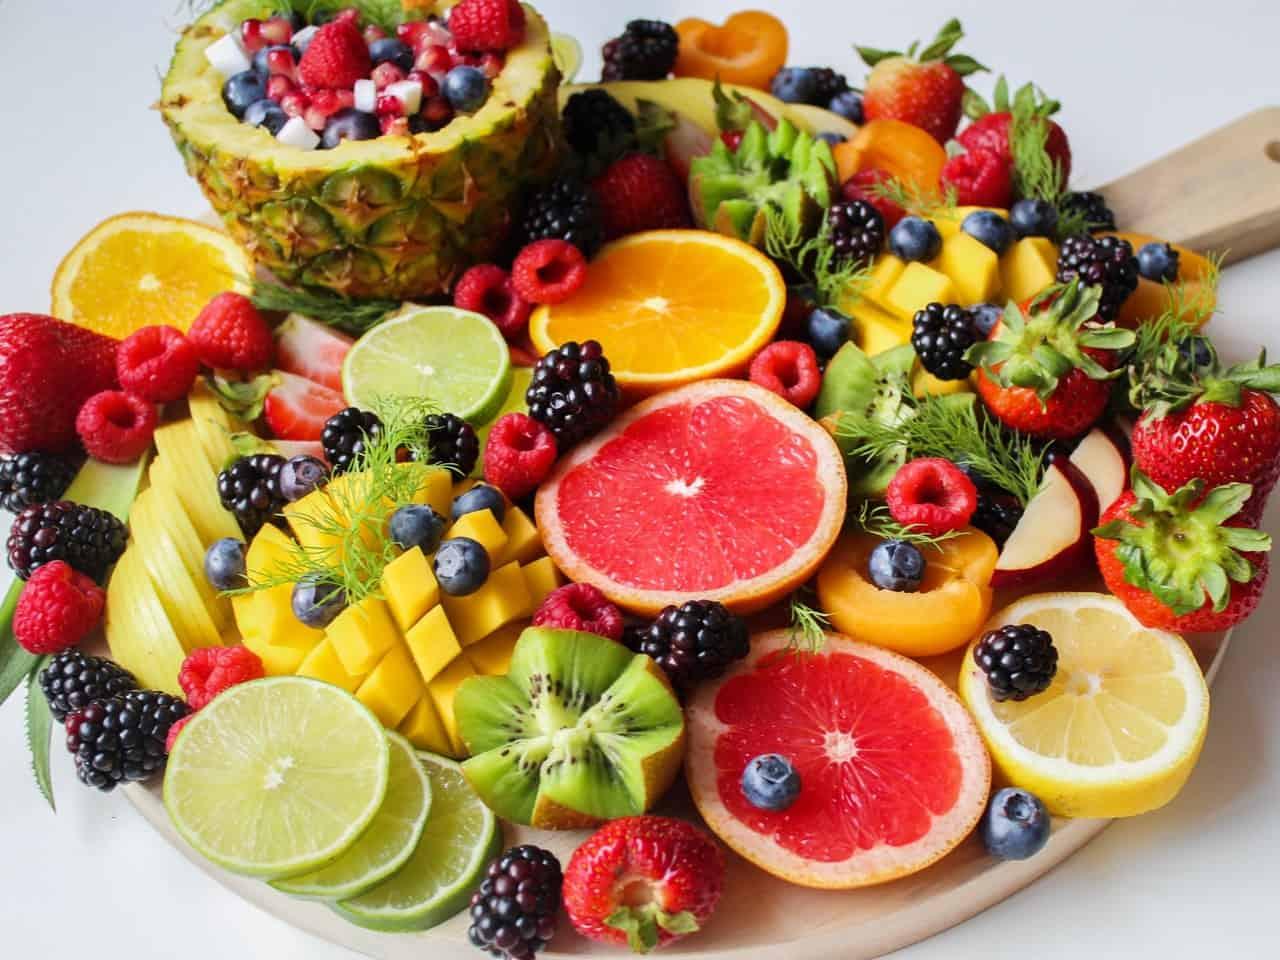 Fruits - gastritis